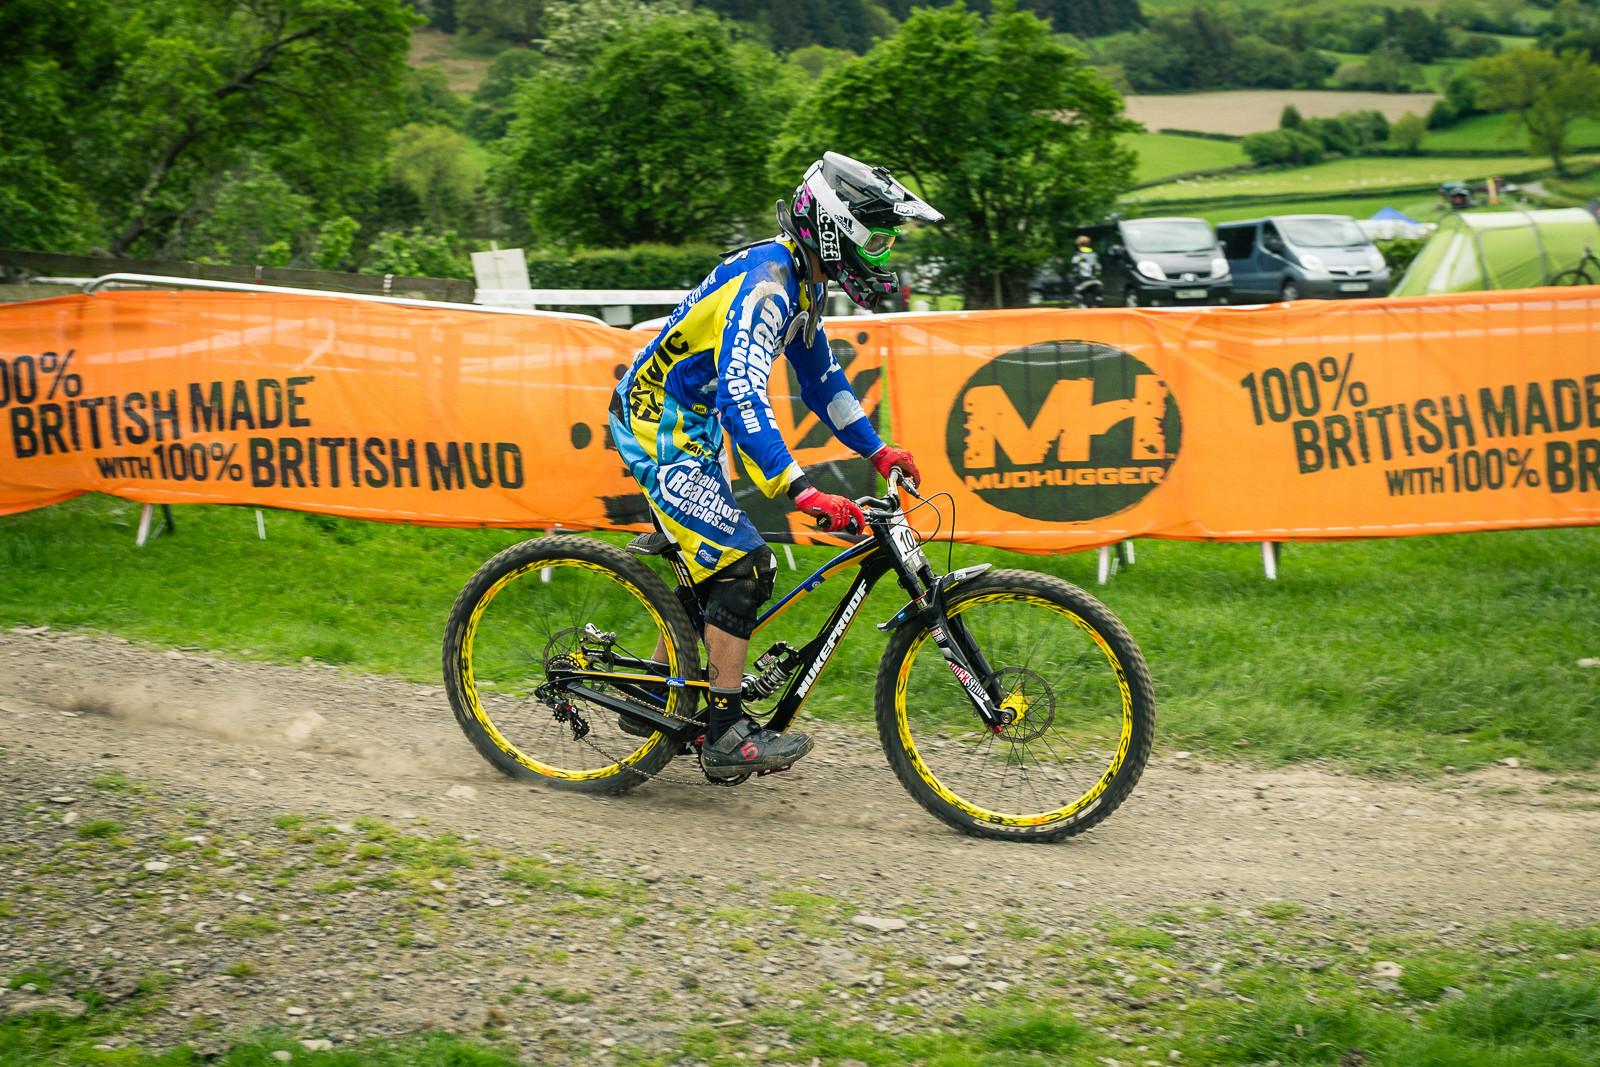 Mike Jones G's Out His Nukeproof Pulse at Llangollen - G-Out Project - Llangollen BDS 2015 - Mountain Biking Pictures - Vital MTB